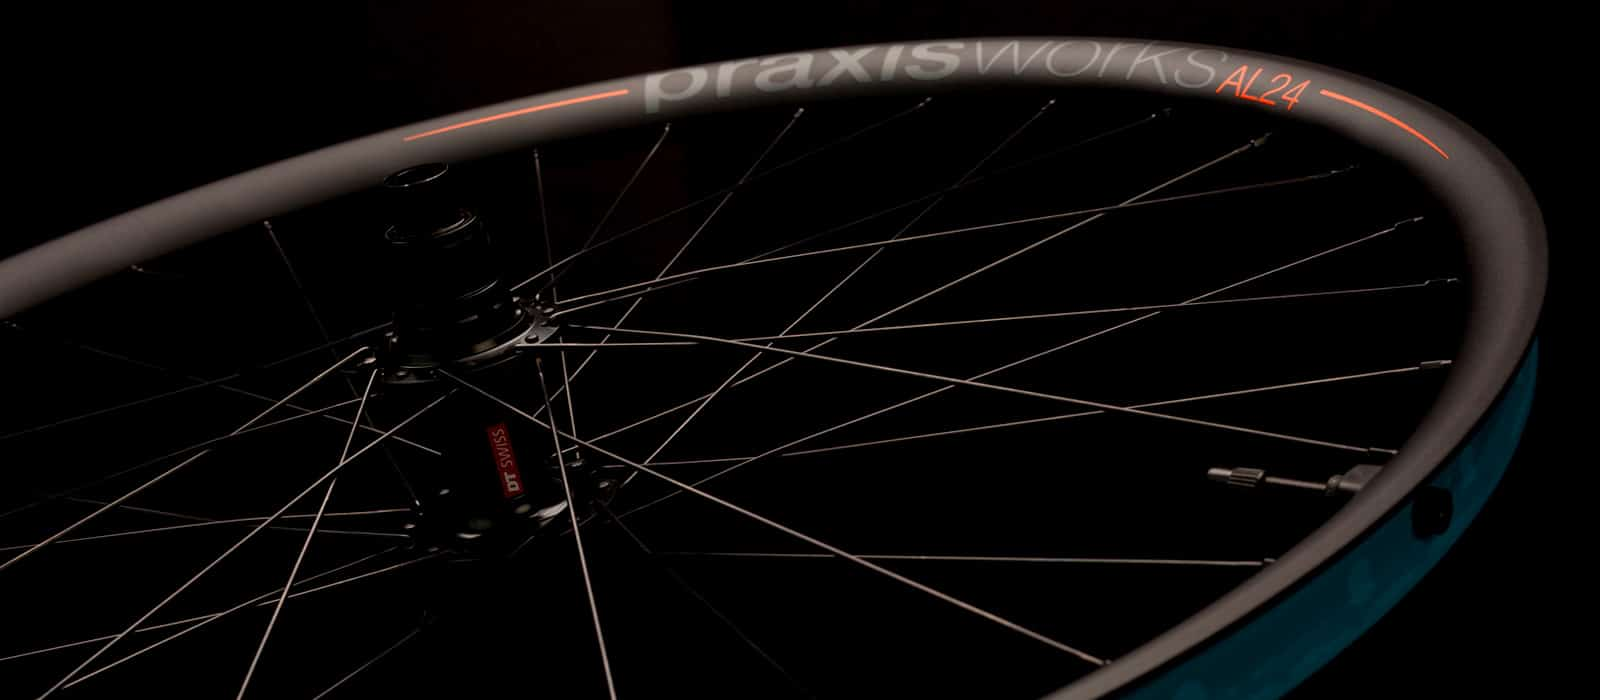 praxis_wheels_slider_AL24-01